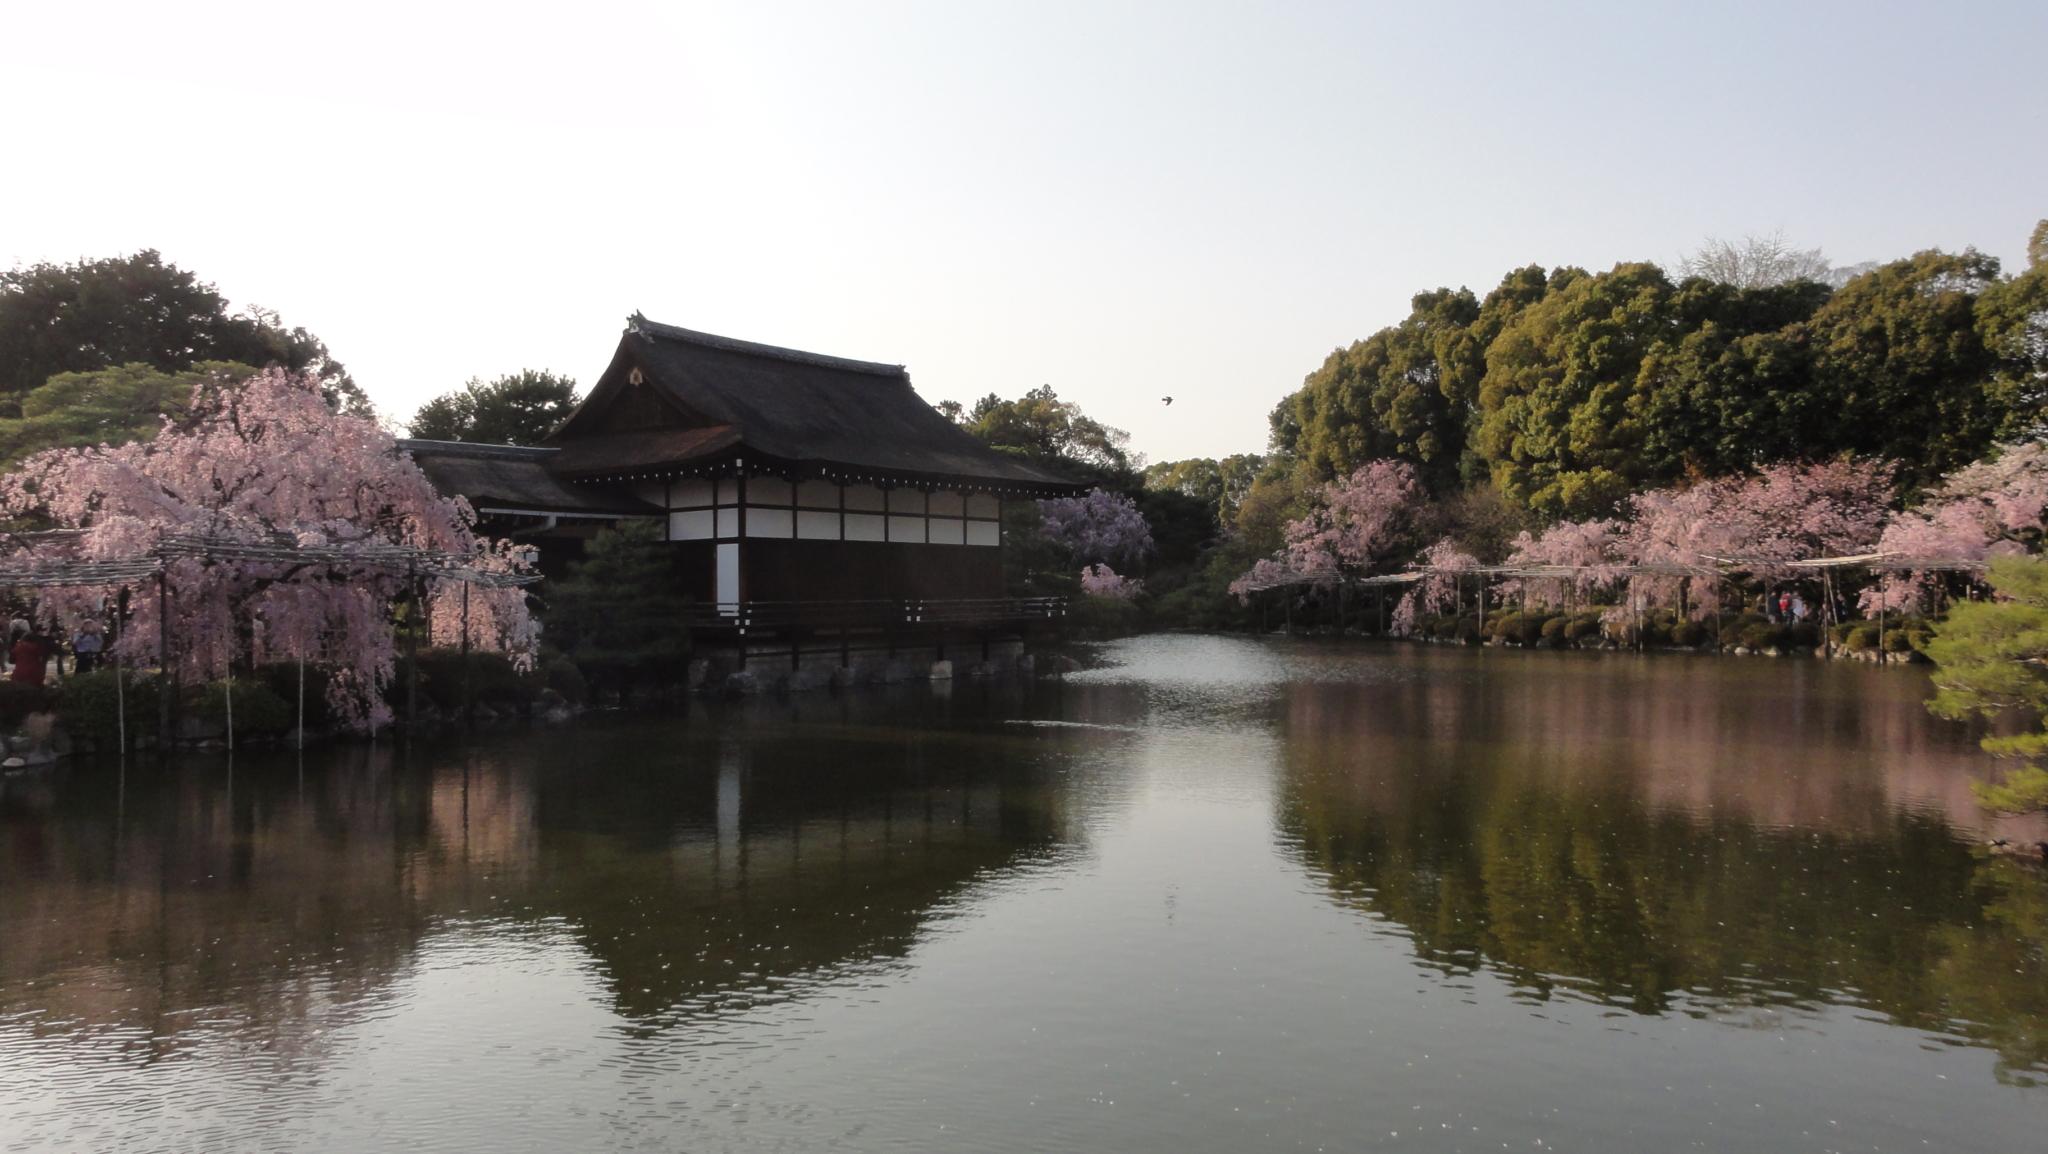 20170414 Kyoto 19